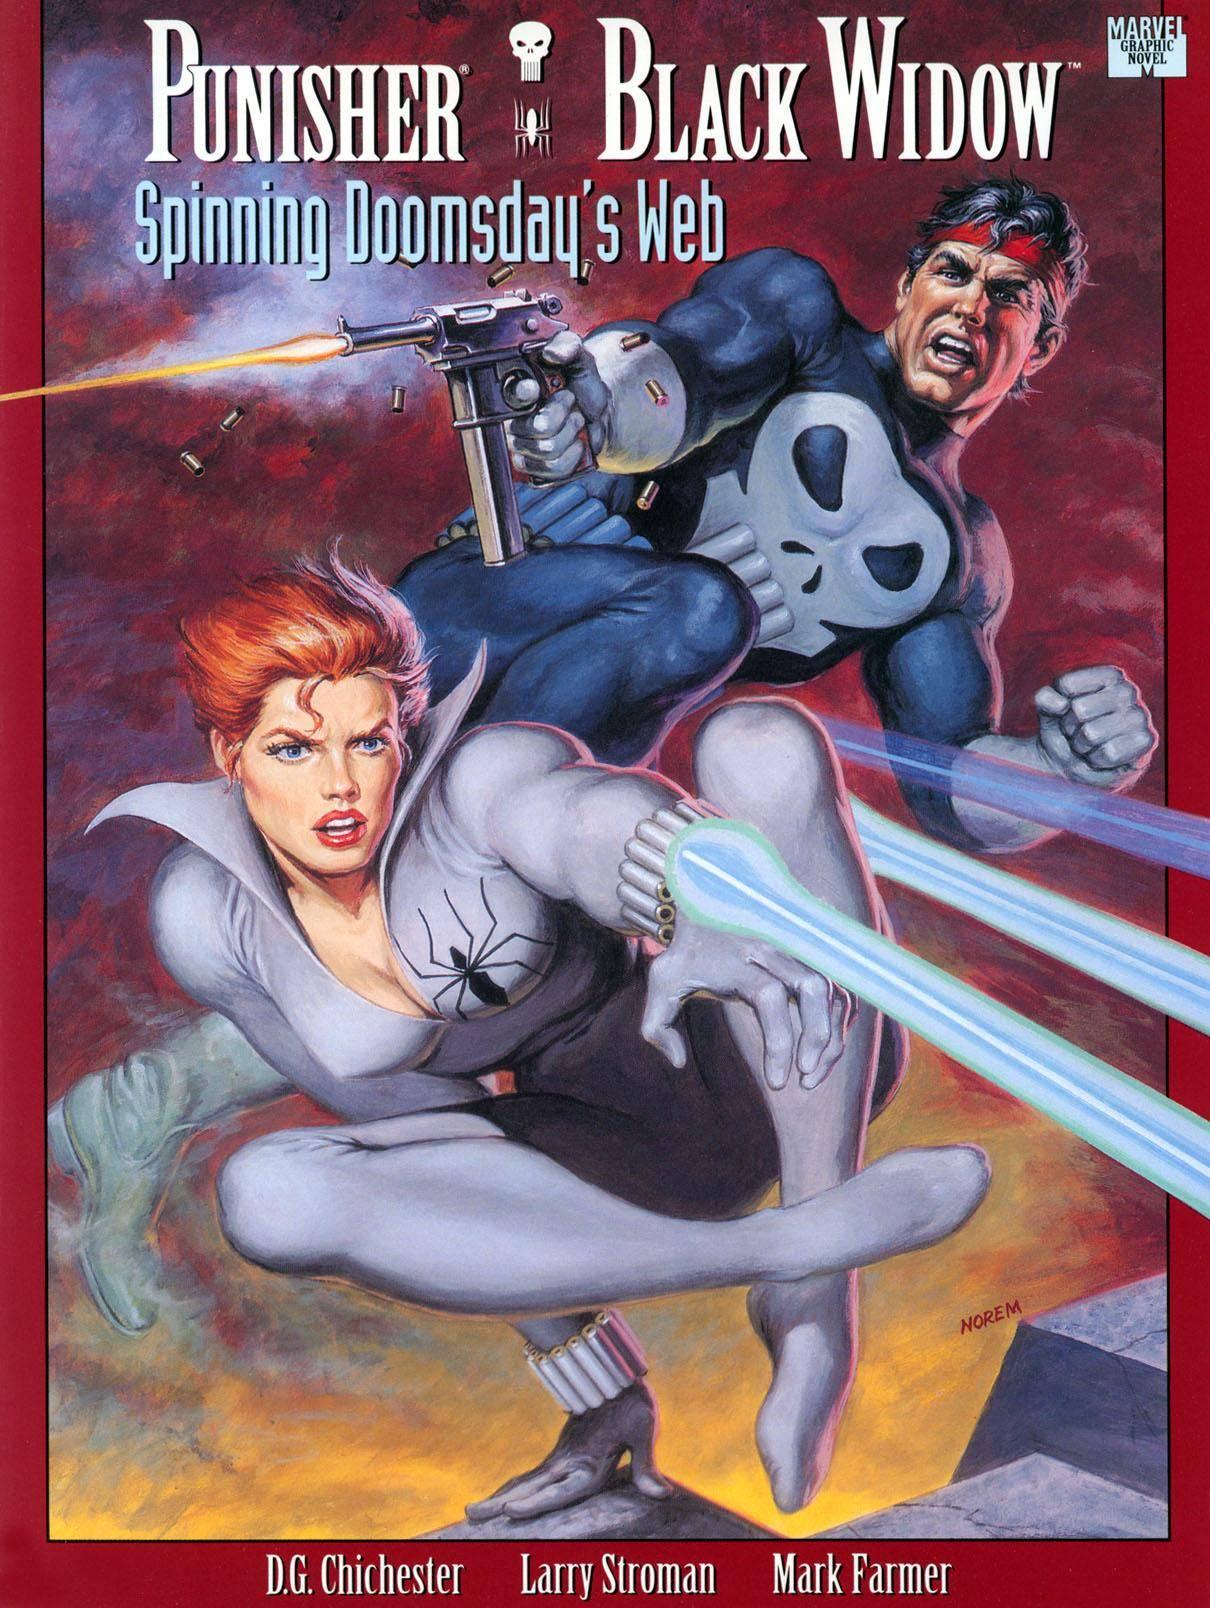 Marvel Graphic Novel 74 - Punisher  Black Widow - Spinning Doomsdays Web 1992